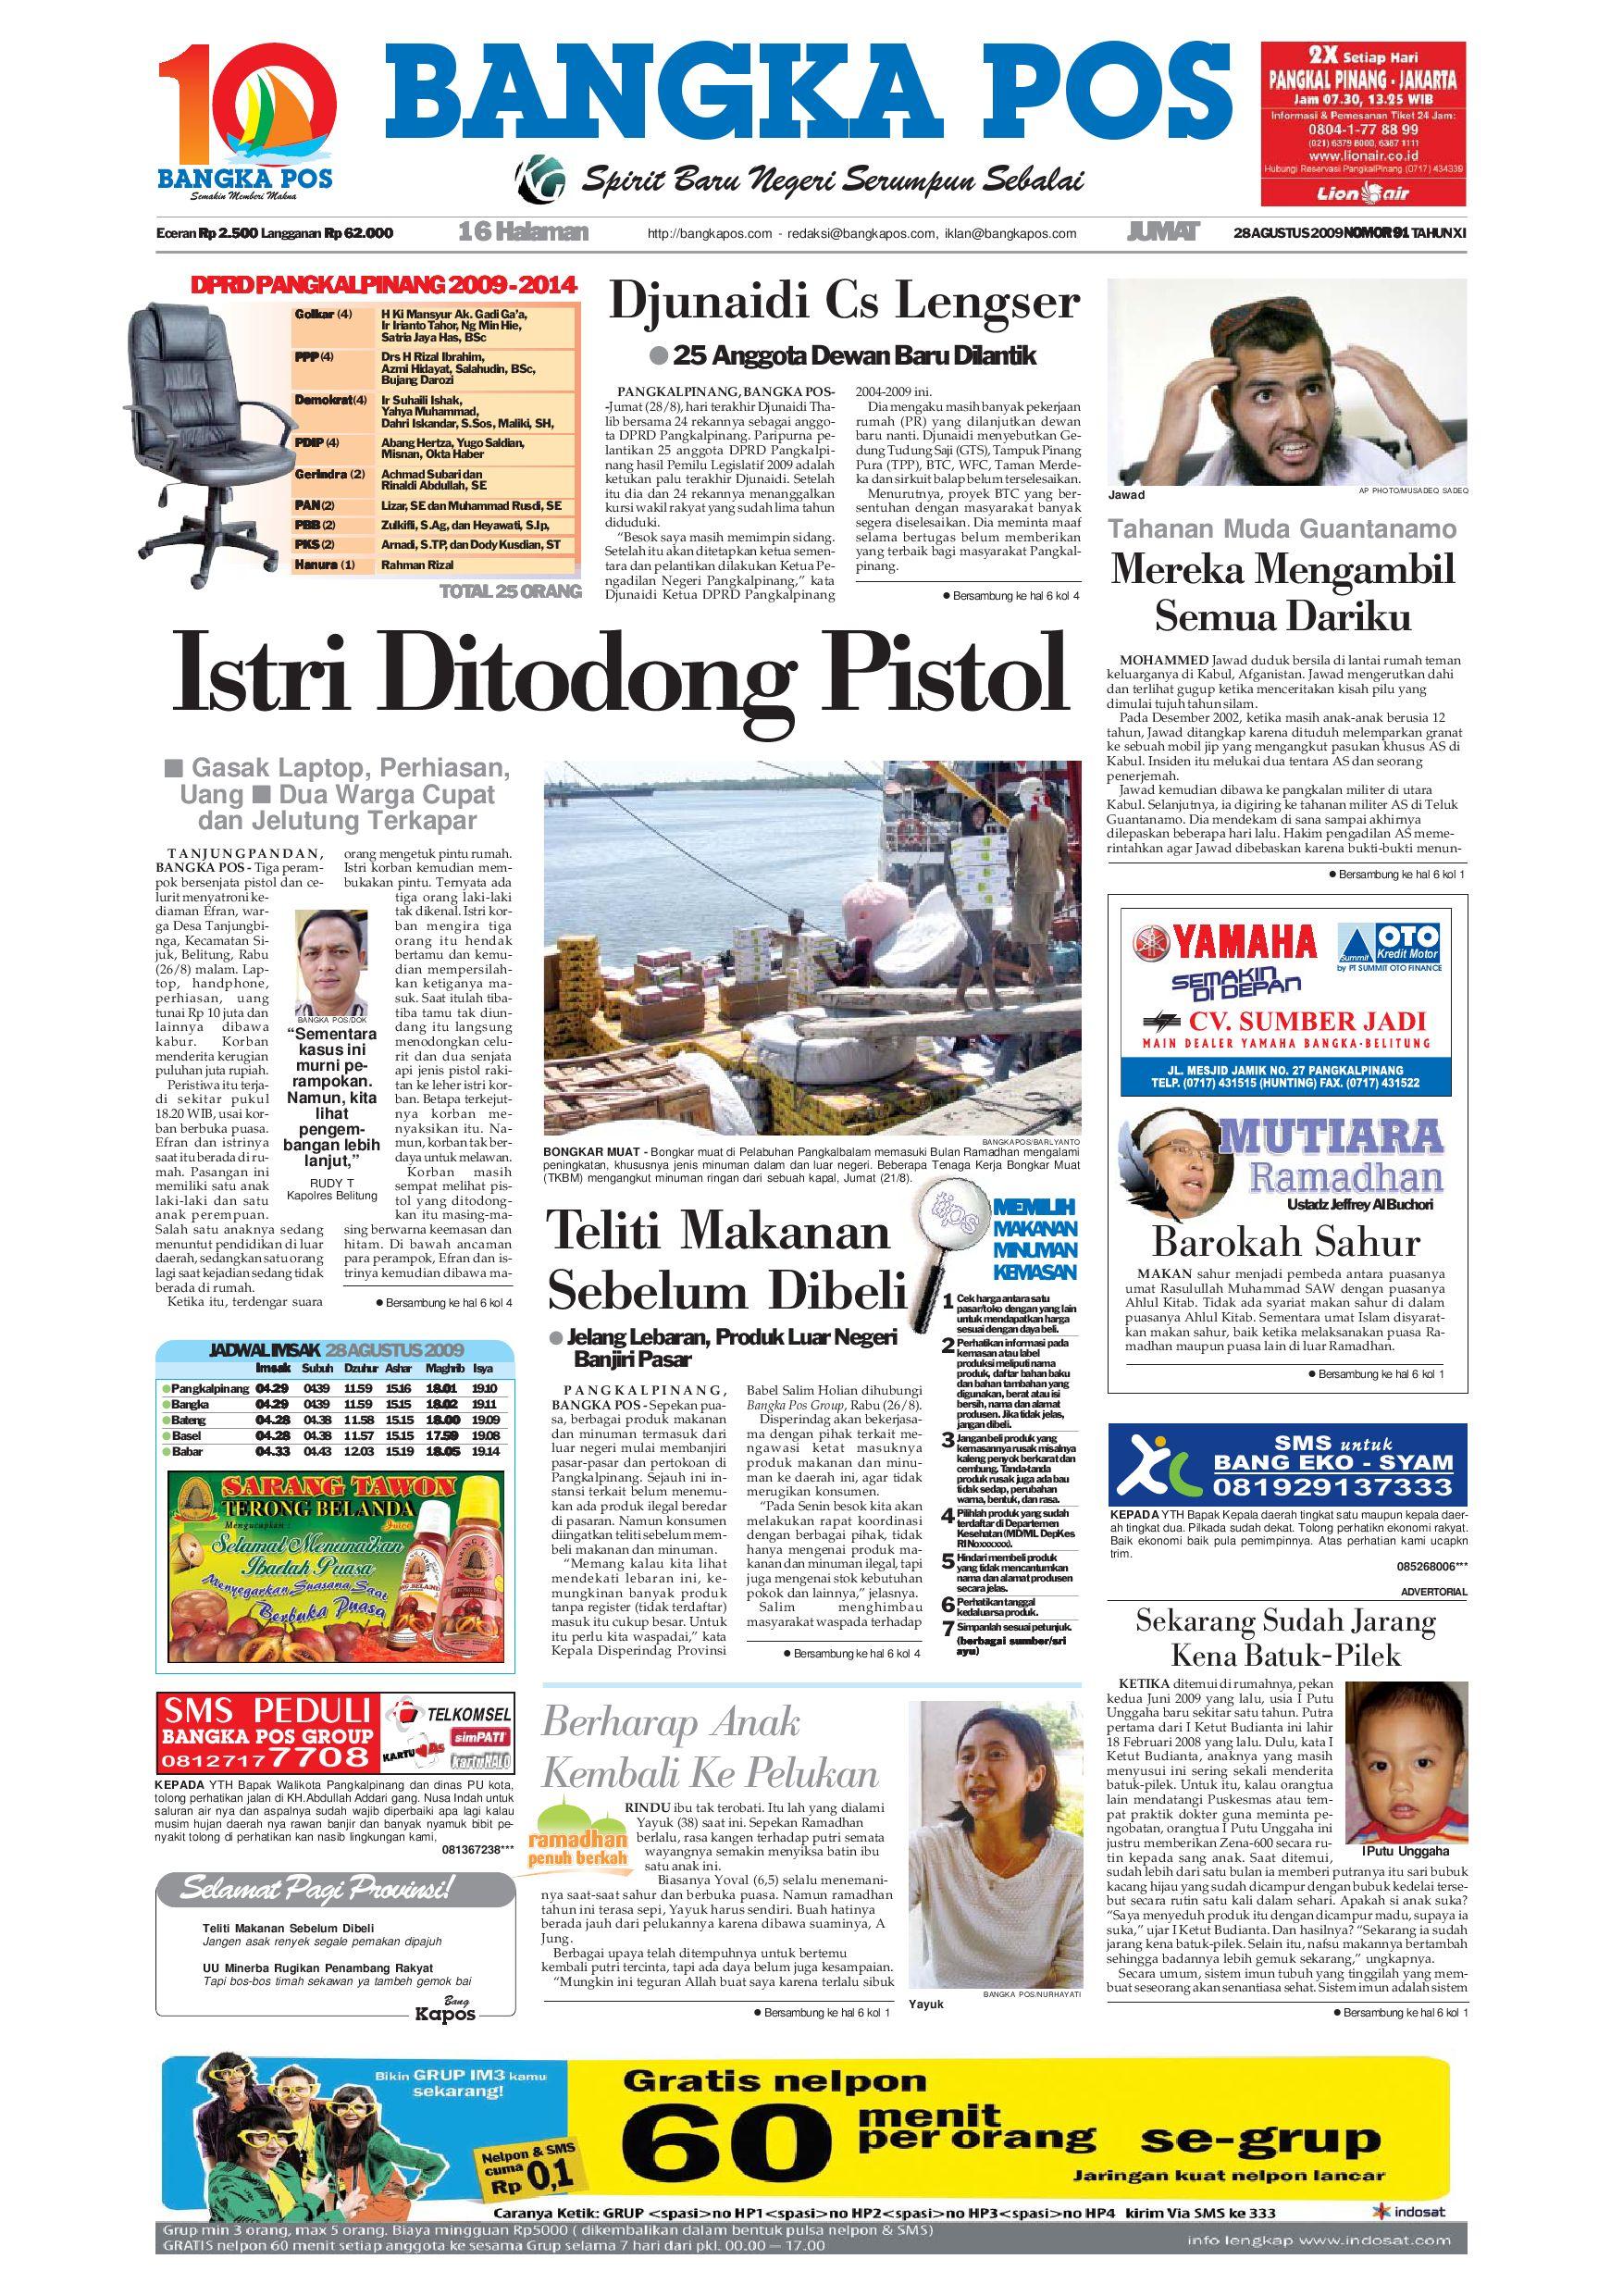 Harian Pagi Bangka Pos Edisi 28 Agustus 2009 By Issuu Parcel Keramik Pja 1644